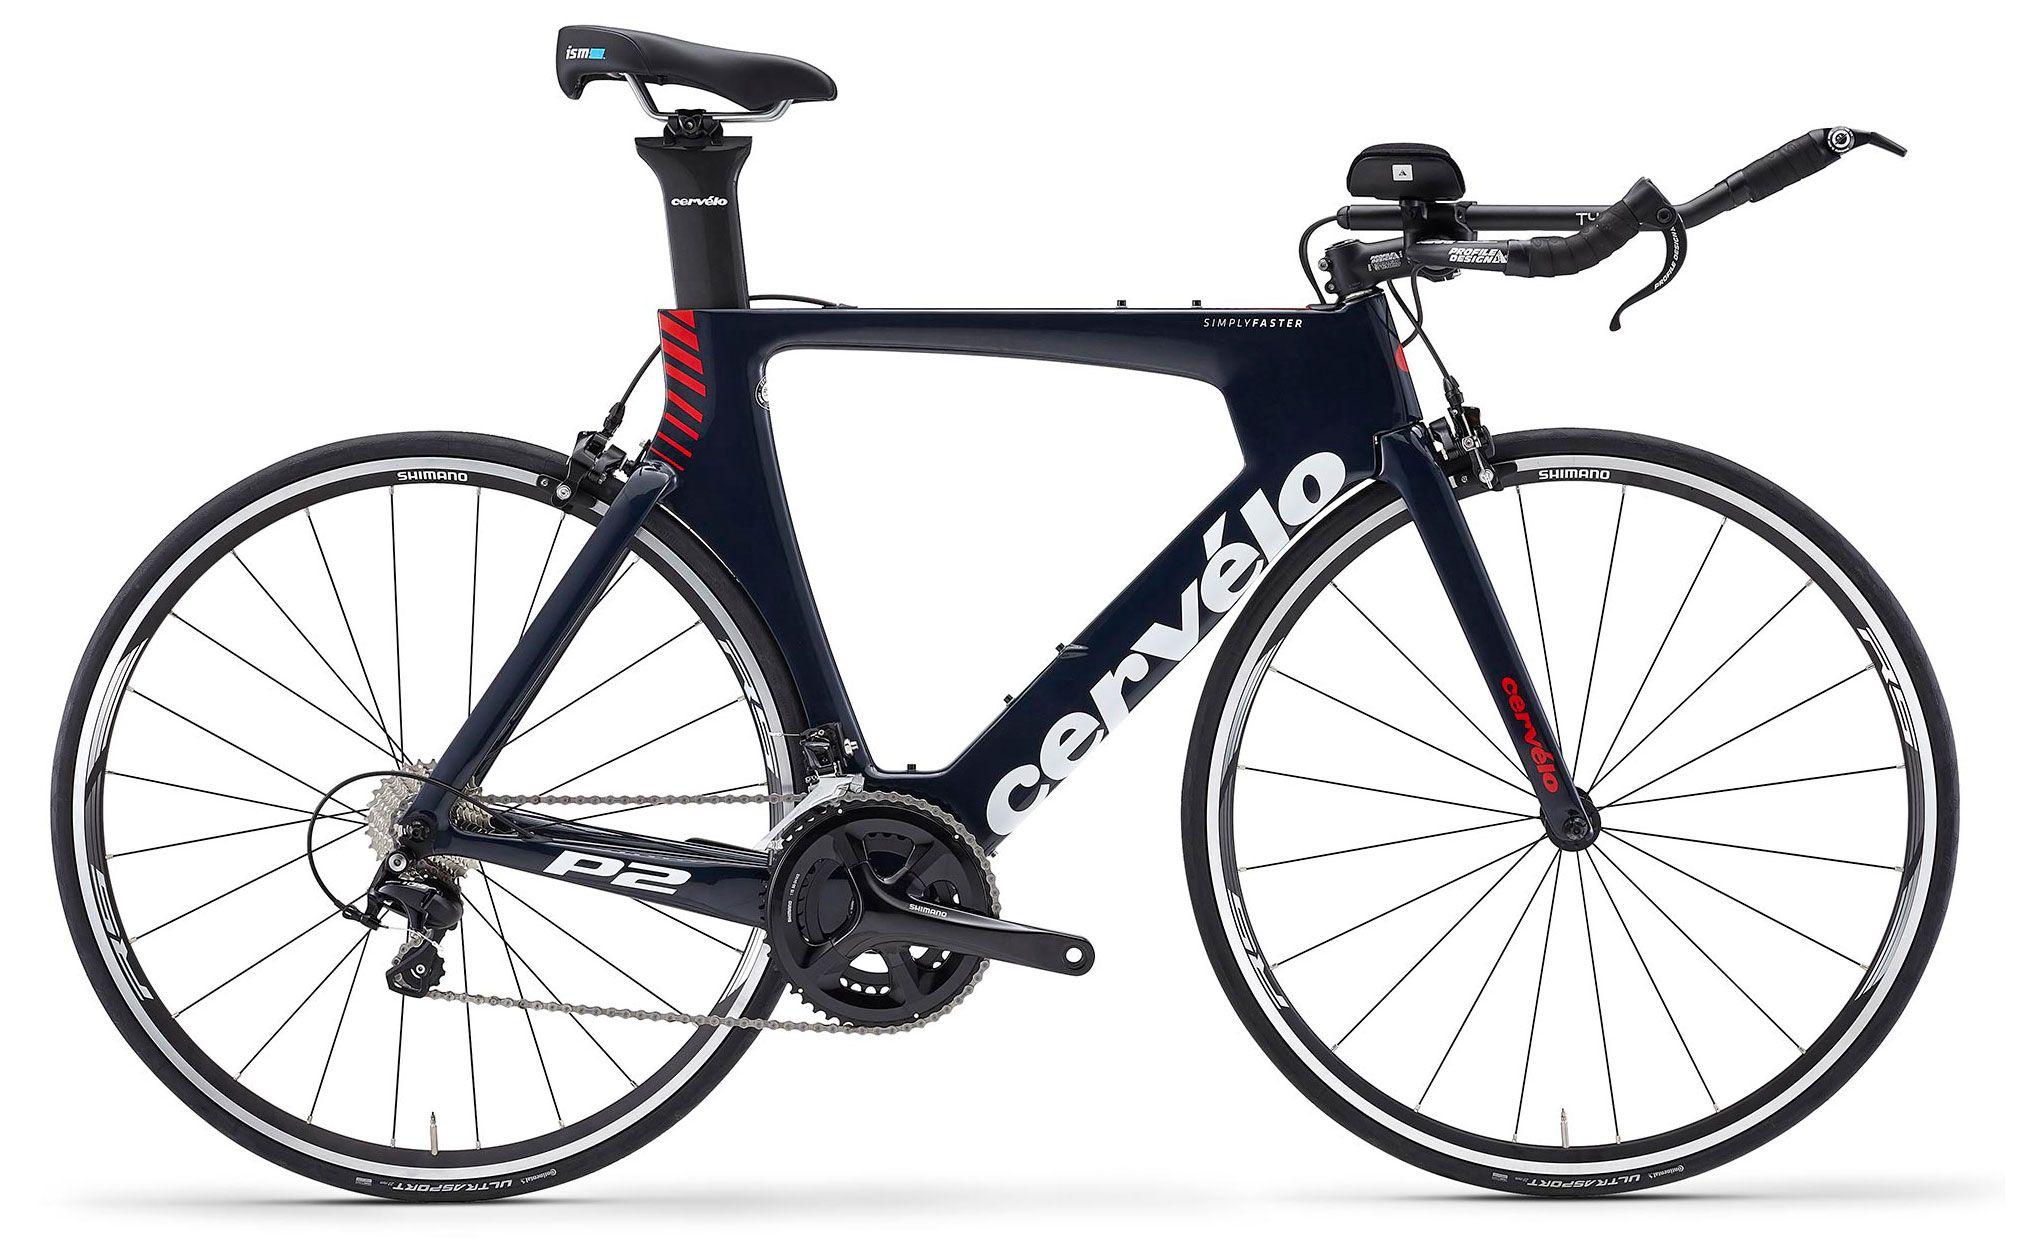 Велосипед Cervelo P2105 2018 велосипед cervelo r3 da 2018